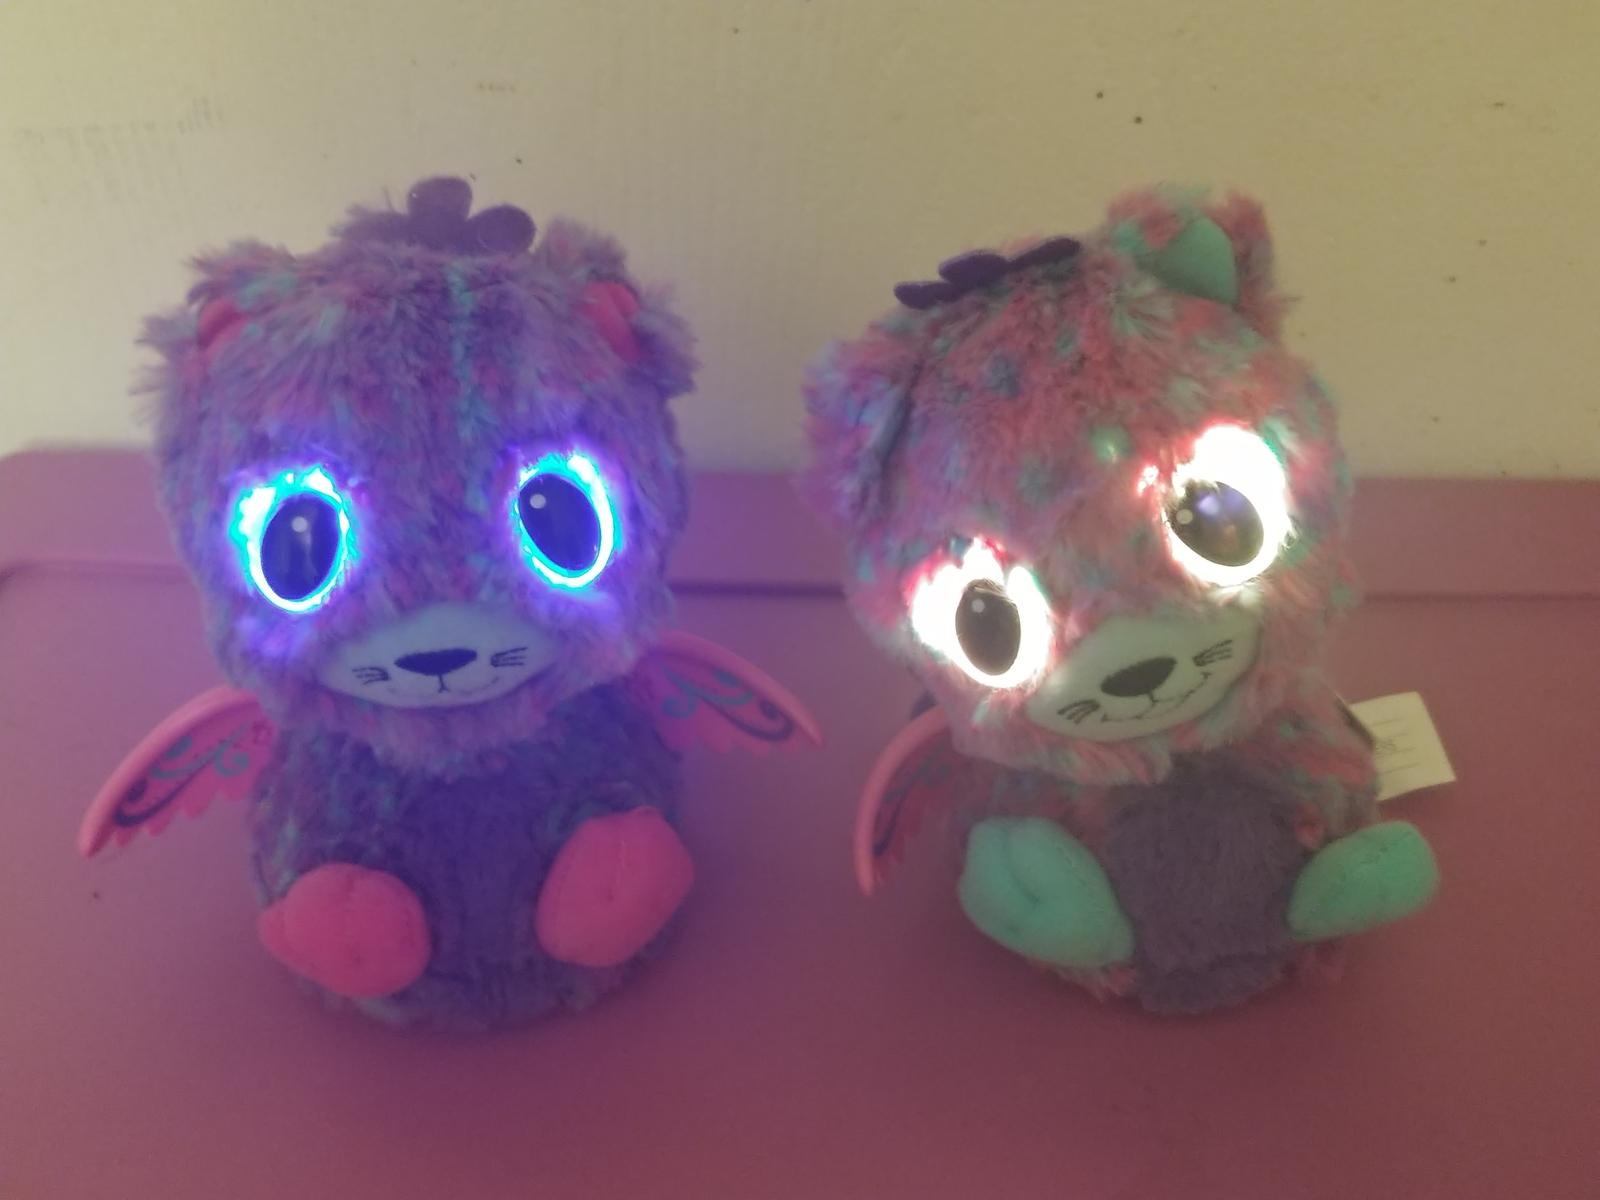 Hatchimal Surprise Twins Peacat Interactive Purple Pink Wings